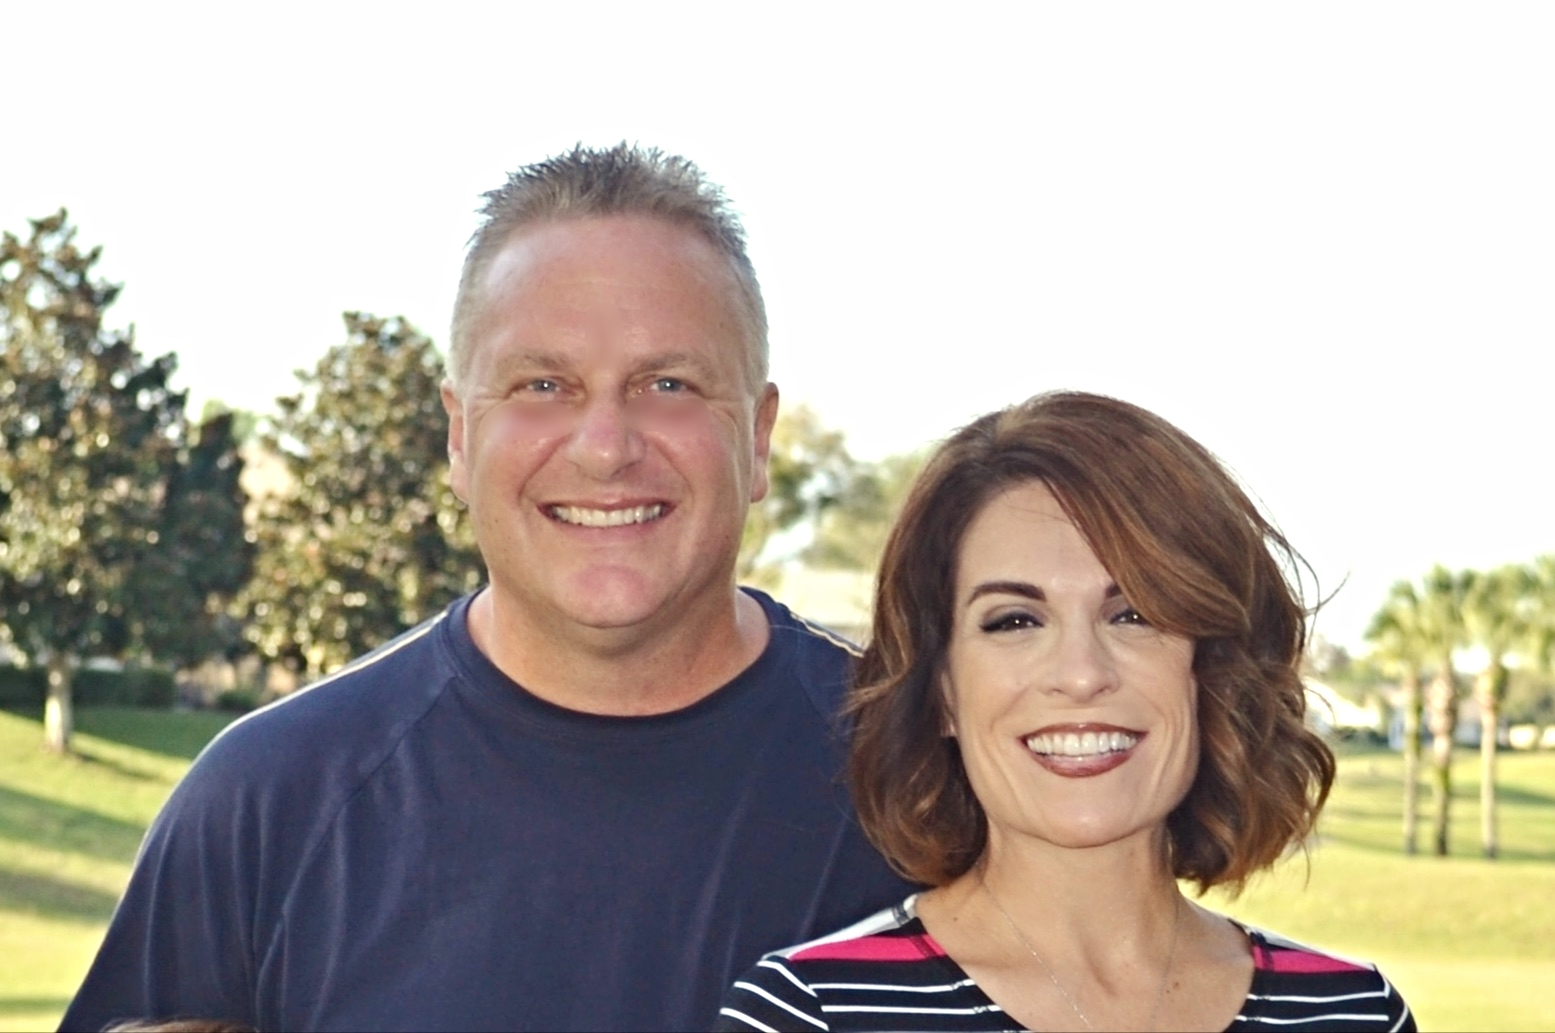 David and Liz Lessing, Worship Leaders